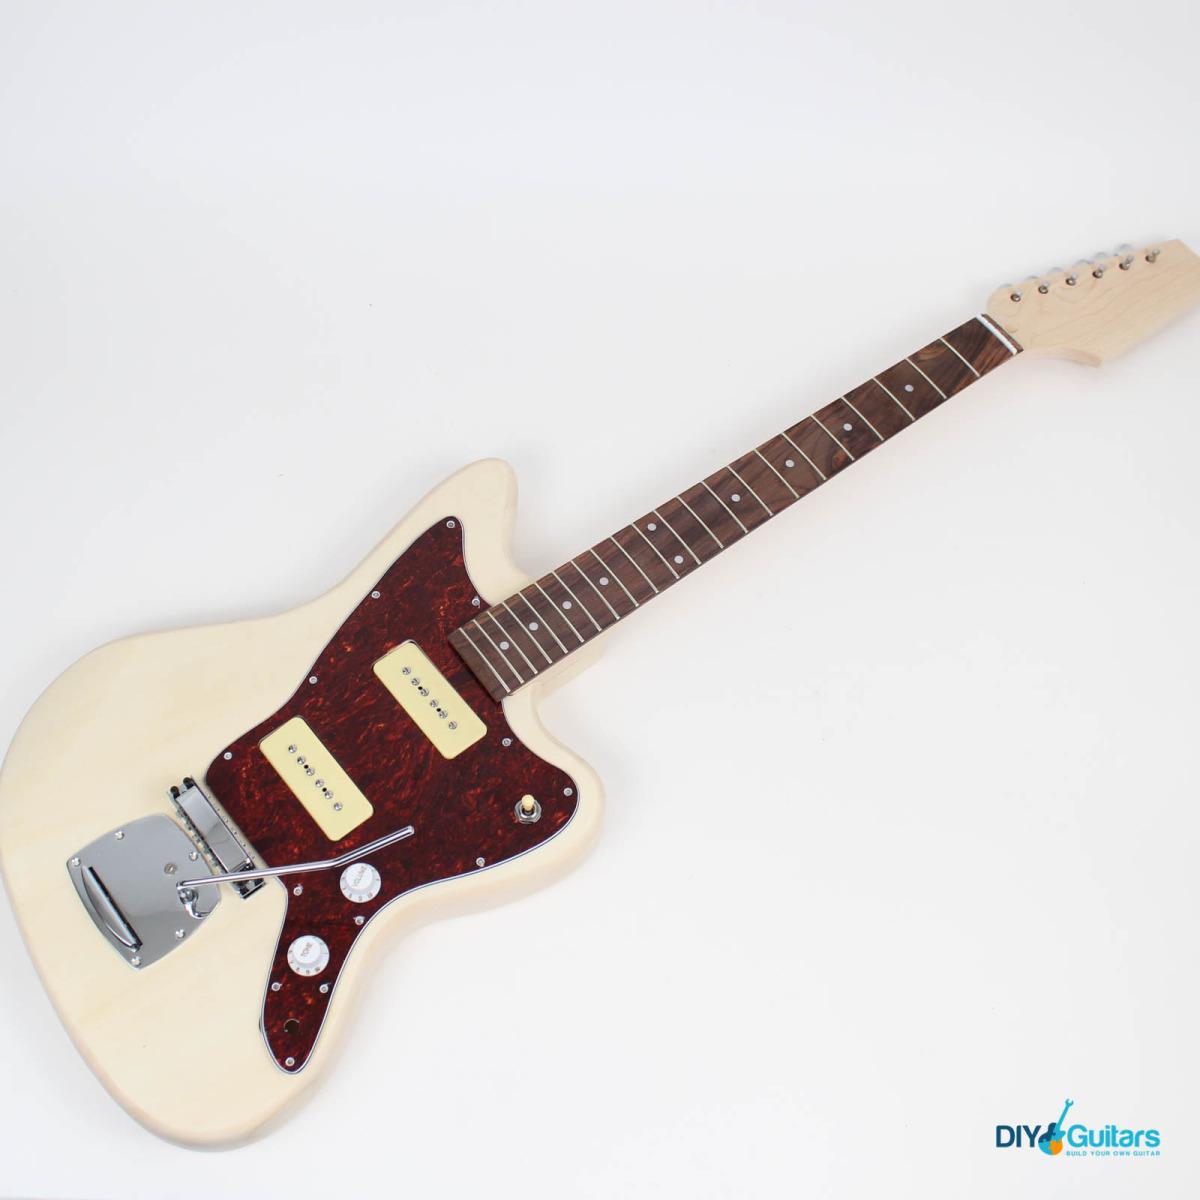 hight resolution of jazzmaster style guitar kit diy guitars explore jazzmaster wiring jazzmaster build and more fender jaguar